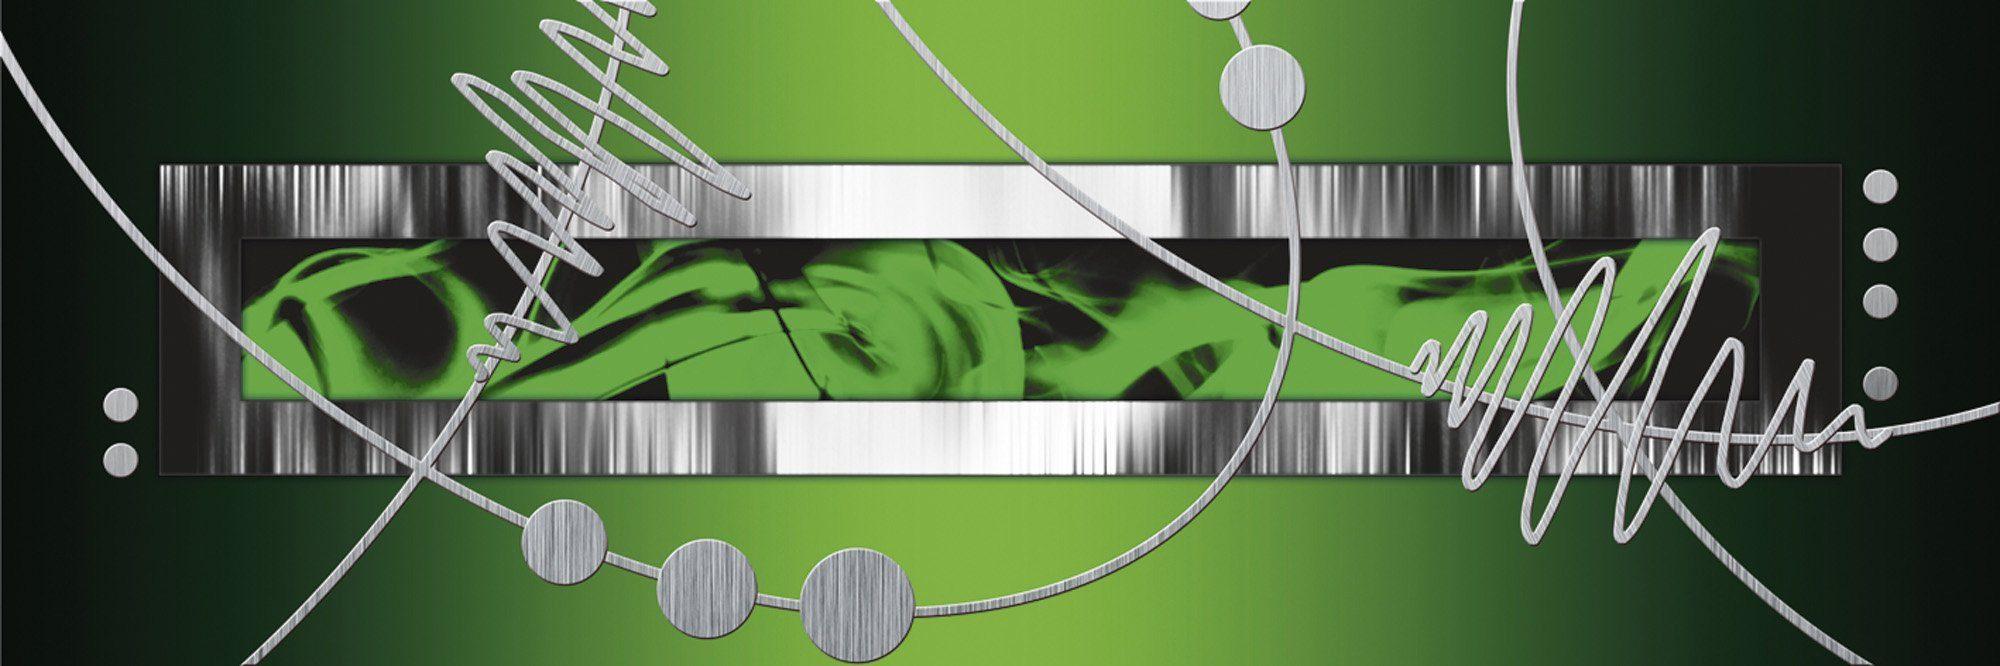 Home affaire Leinwandbild »Jule: Silber abstrakt auf Grün«, 120/40 cm